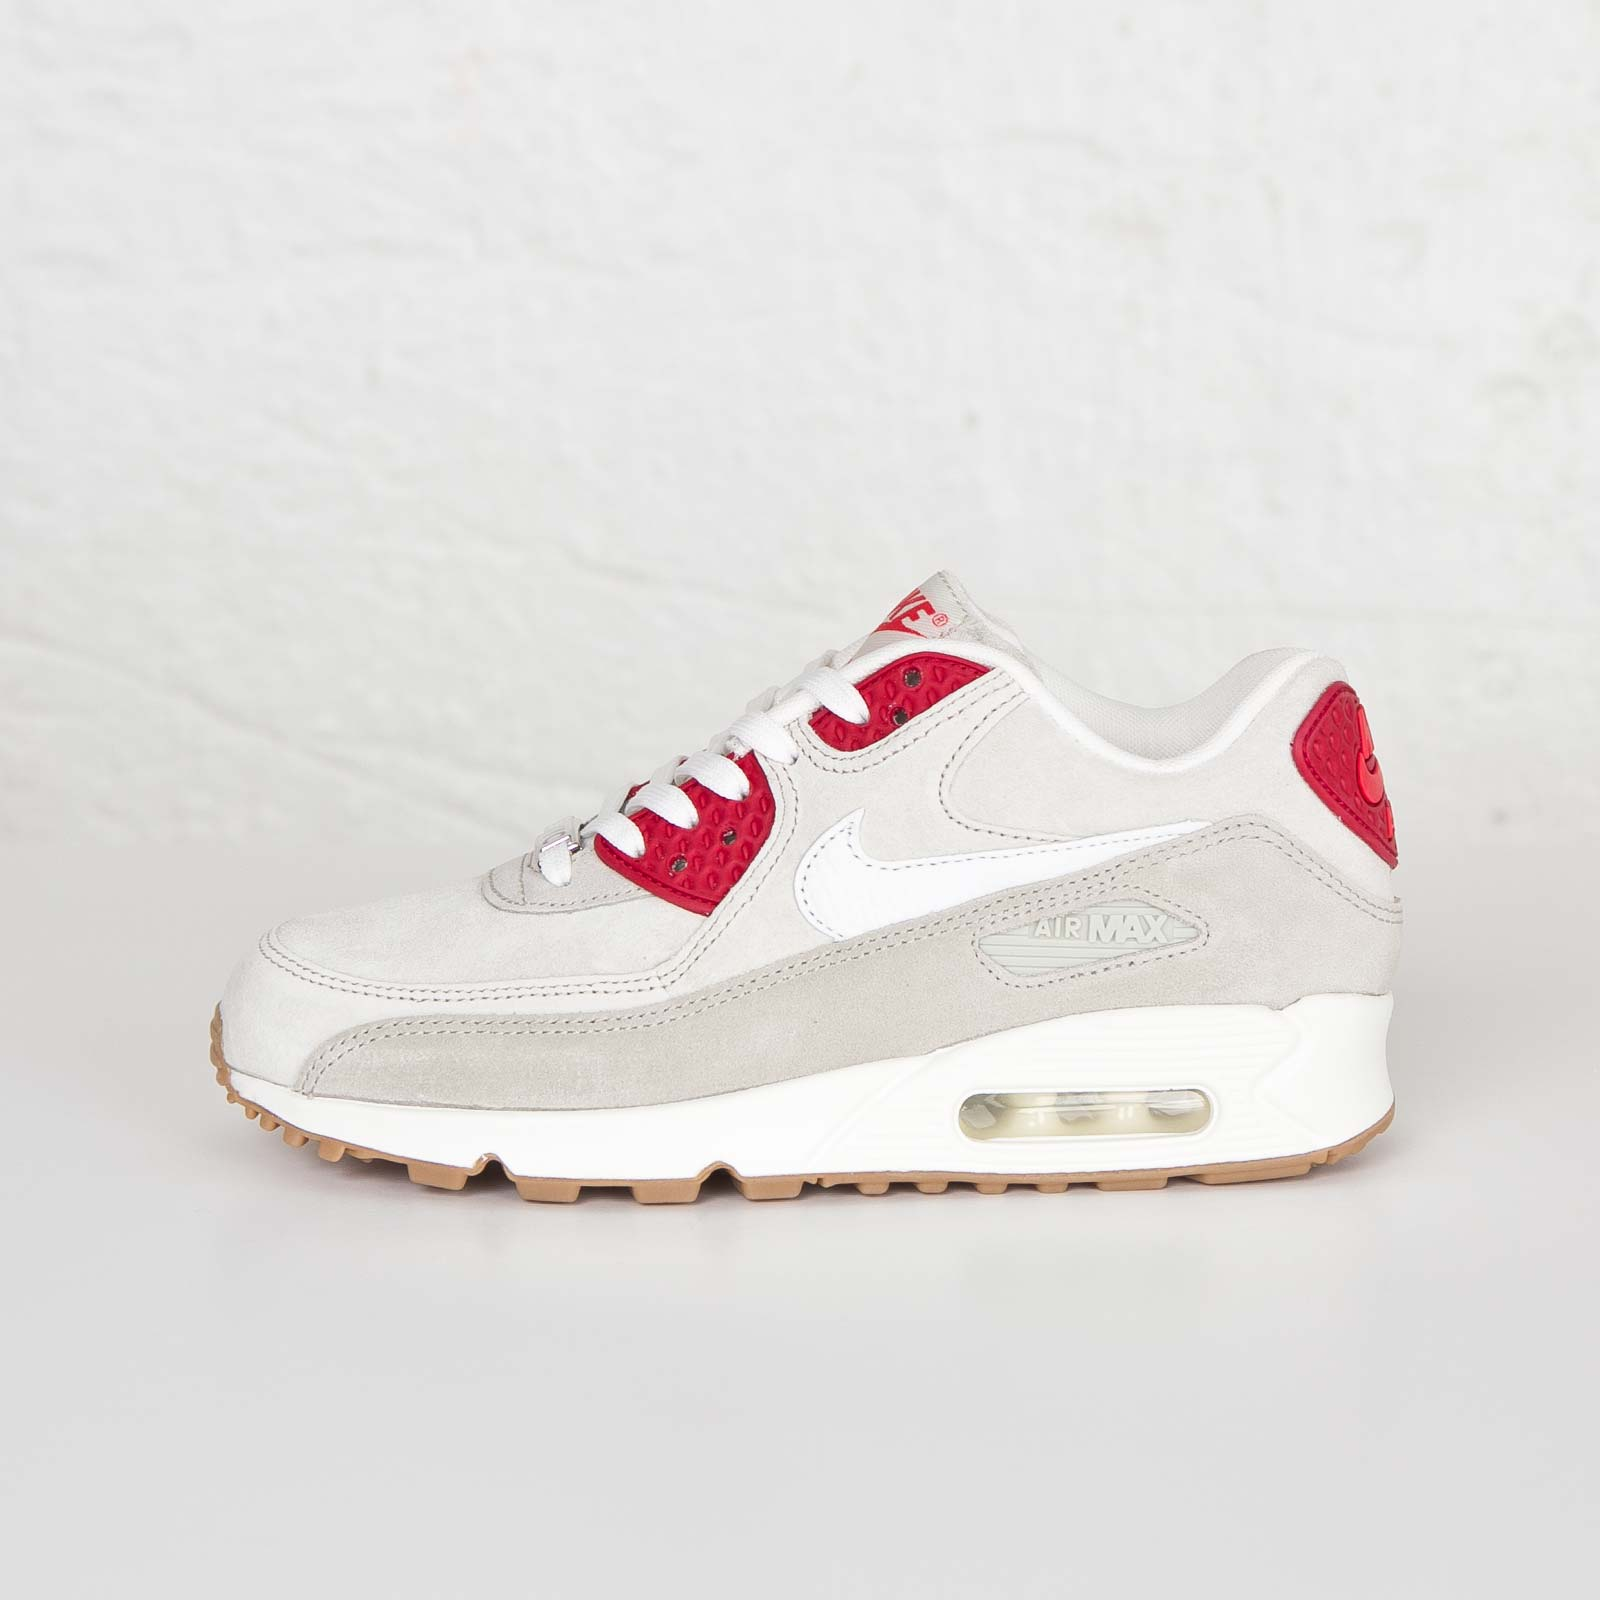 Nike Wmns Air Max 90 QS 813150 200 Sneakersnstuff